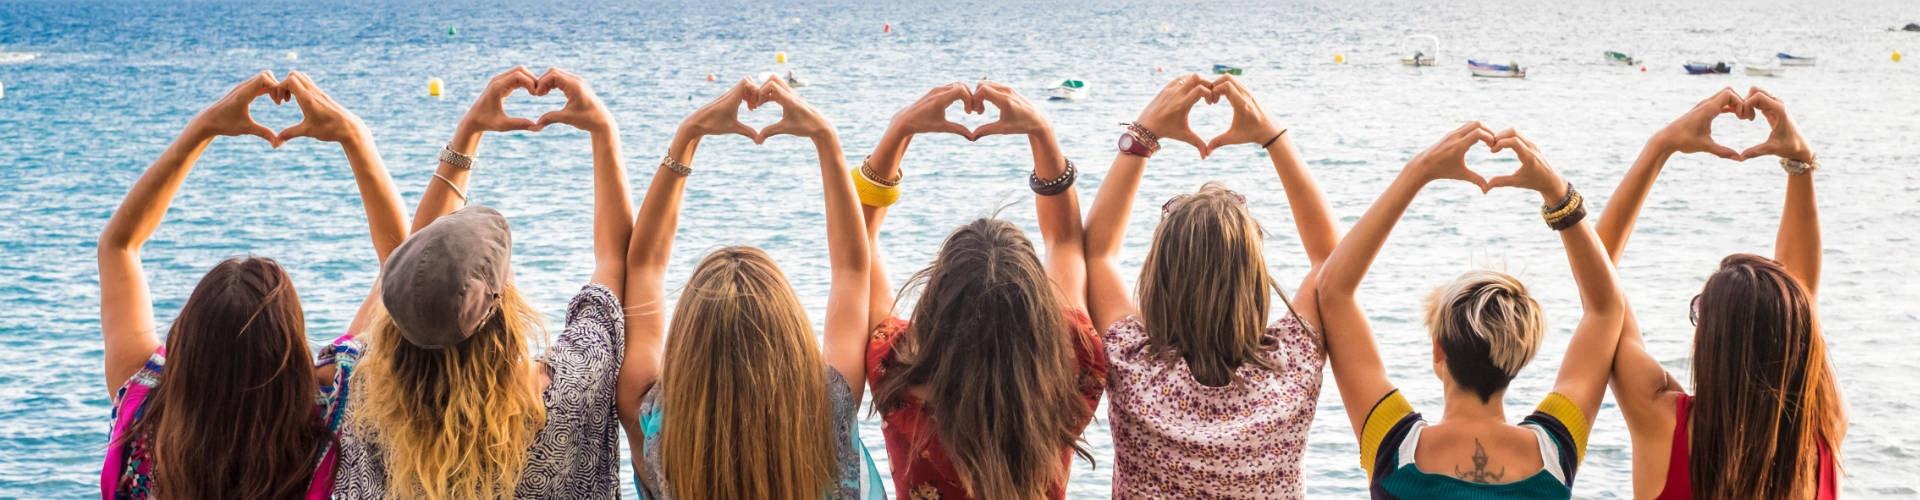 Girls in Italy